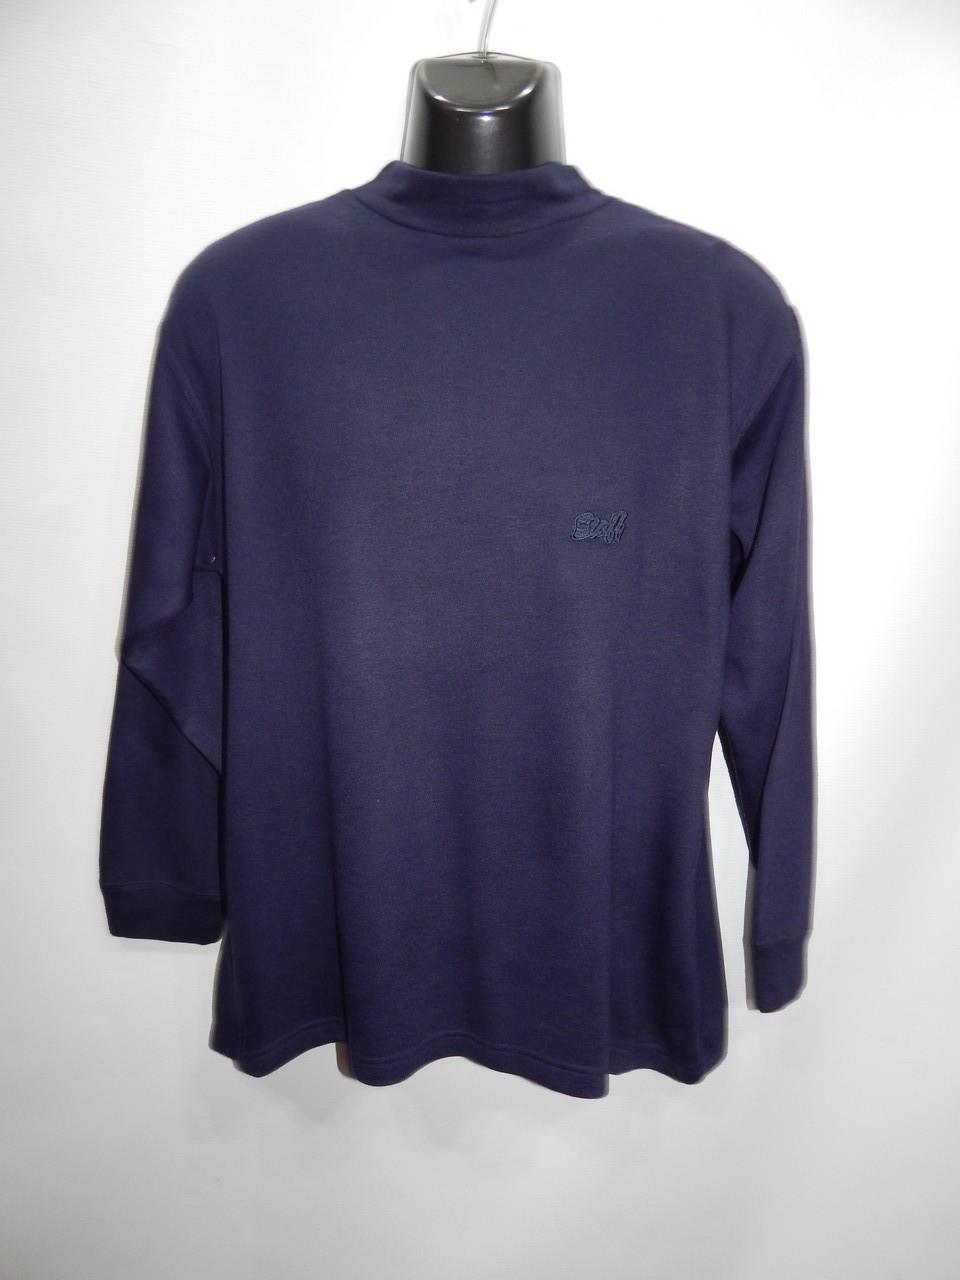 Мужская теплая кофта (свитшот) Ravision р.48-50 040SMT